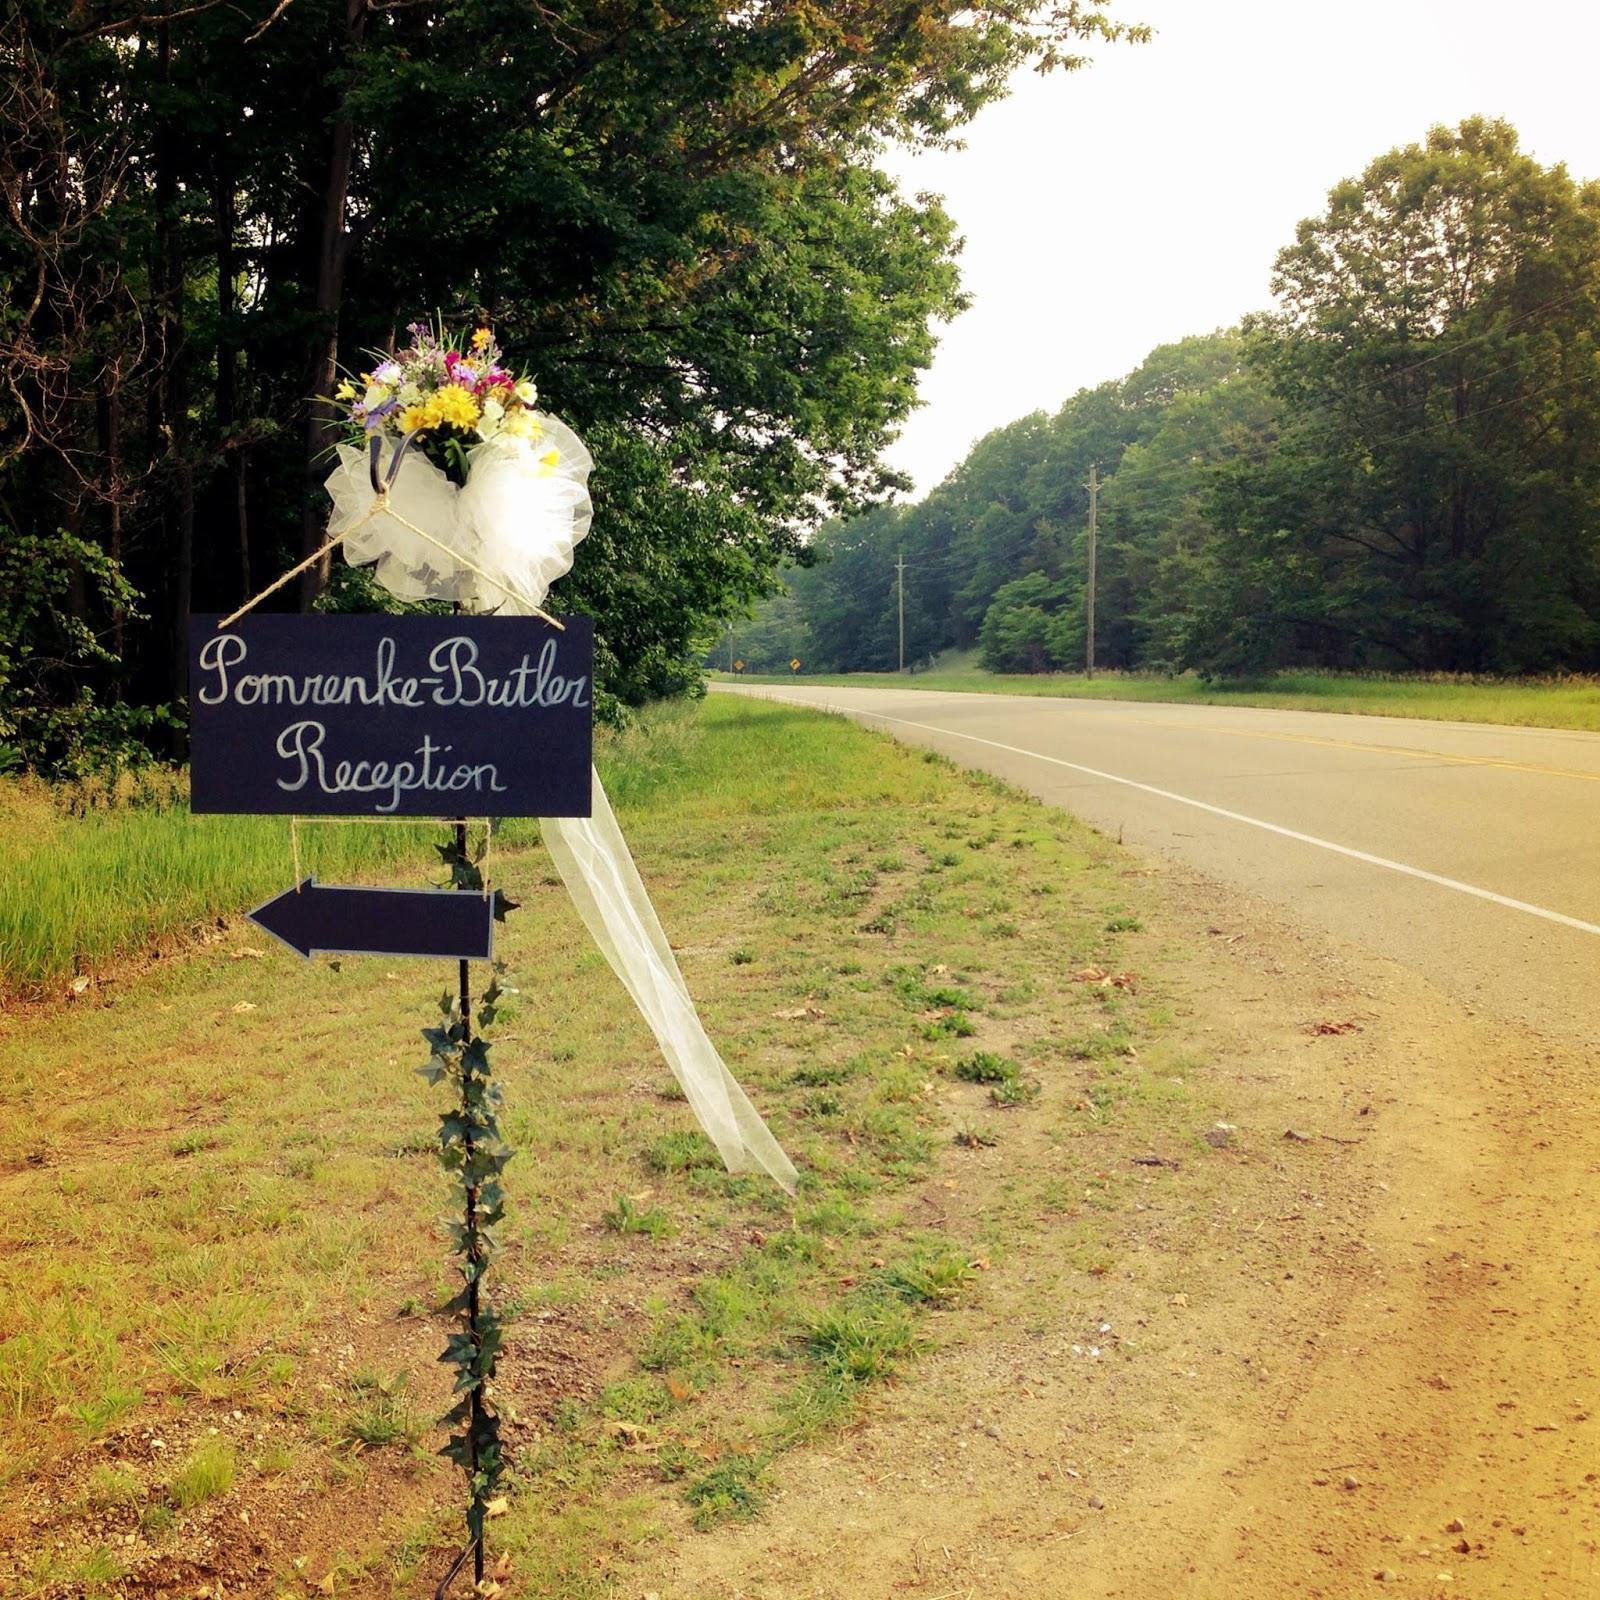 Beach Wedding Ideas On A Budget: Cricutcraftyclare: Beach Wedding On A Budget